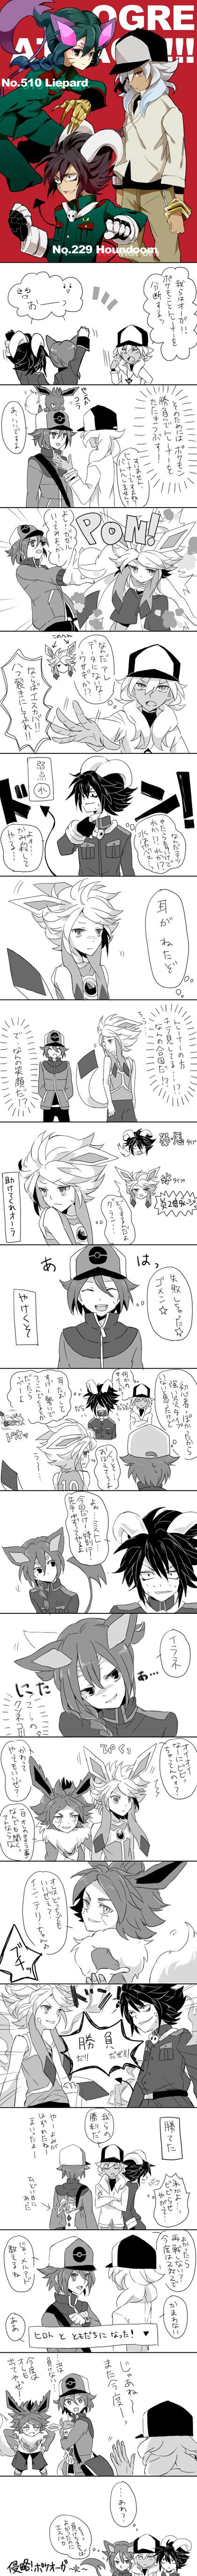 Tags: Anime, Masui, Inazuma Eleven, Pokémon, Nagumo Haruya, Esca Bamel, Kiyama Hiroto, Badarp Slead, Suzuno Fuusuke, Mistorene Callus, Houndoom (Cosplay), Glaceon (Cosplay), Touya (Pokémon) (Cosplay)